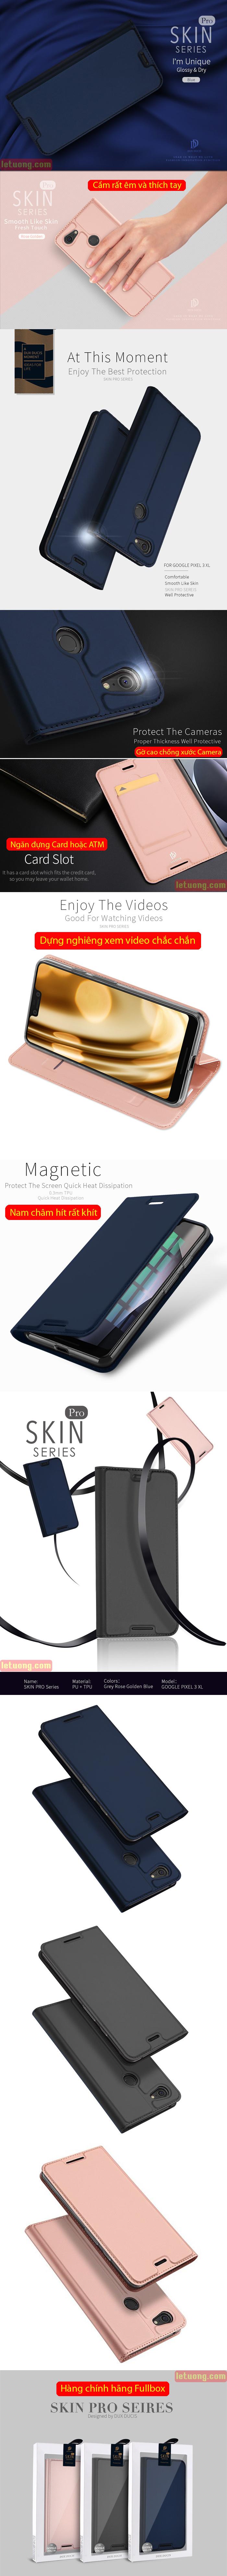 Bao da Google Pixel 3 XL Dux Ducis Skin khung mềm, siêu mỏng 4